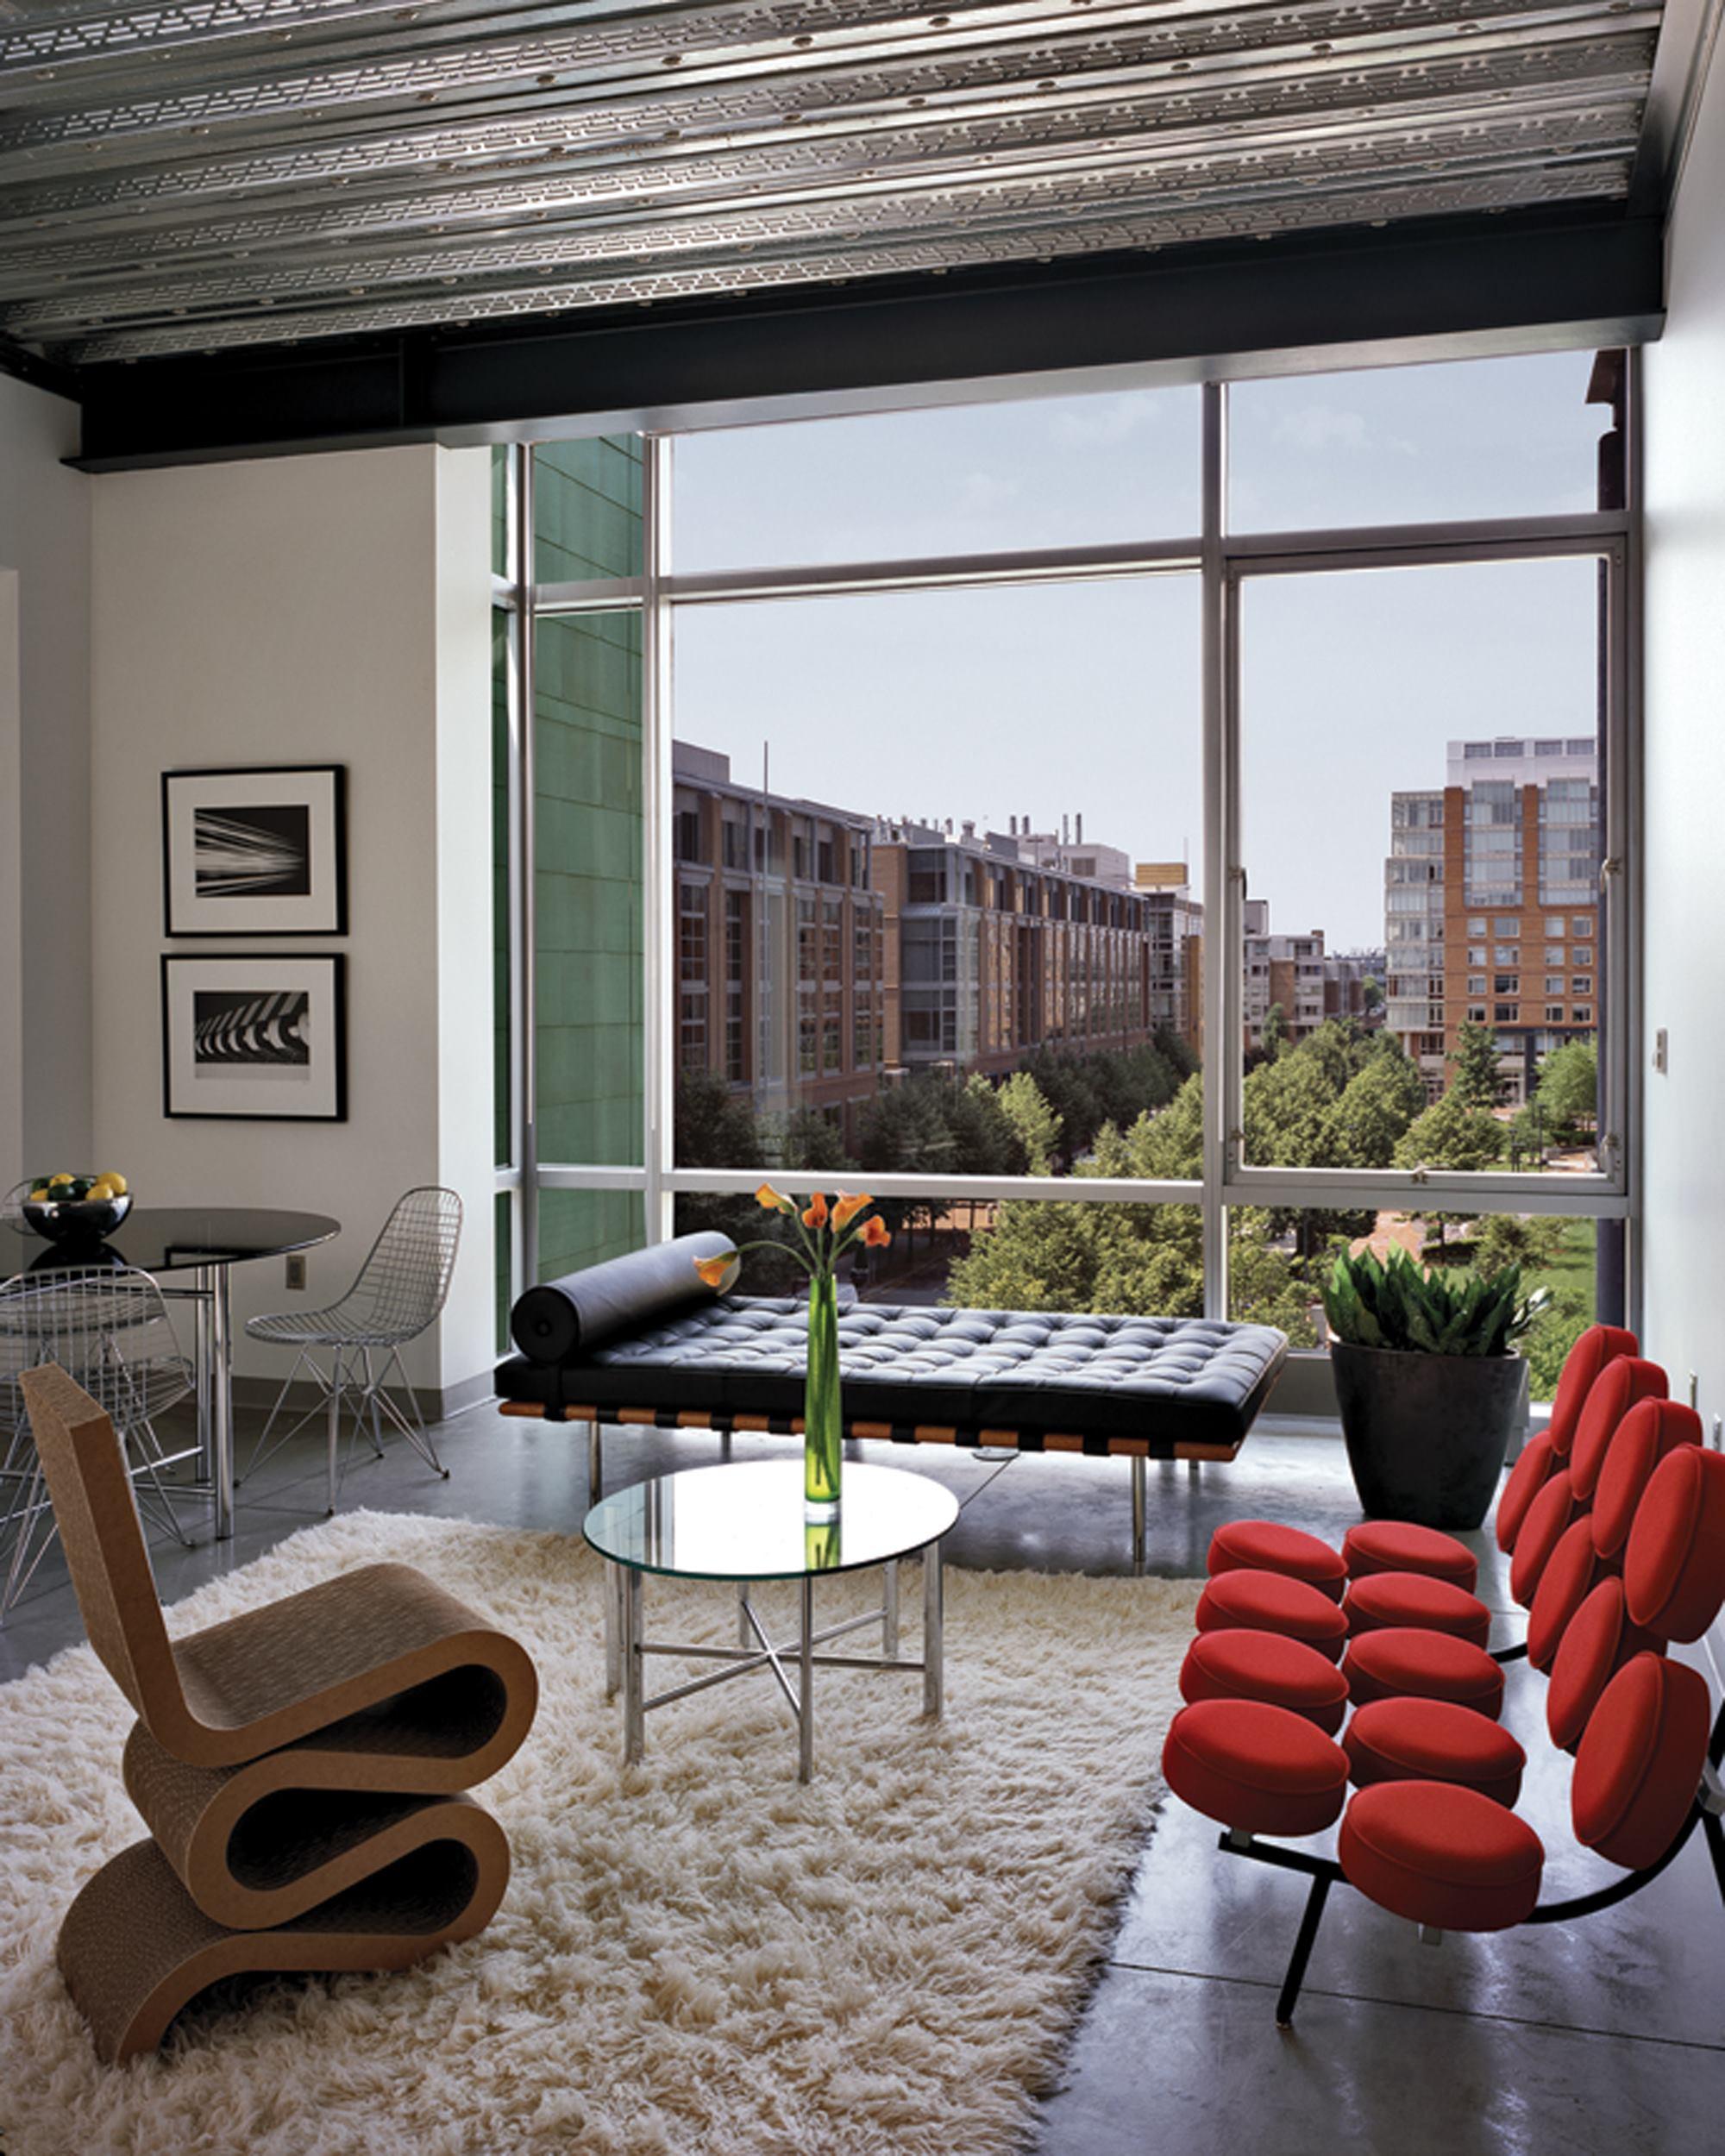 Loft23 cambridge mass residential architect loft for Residential architect design awards